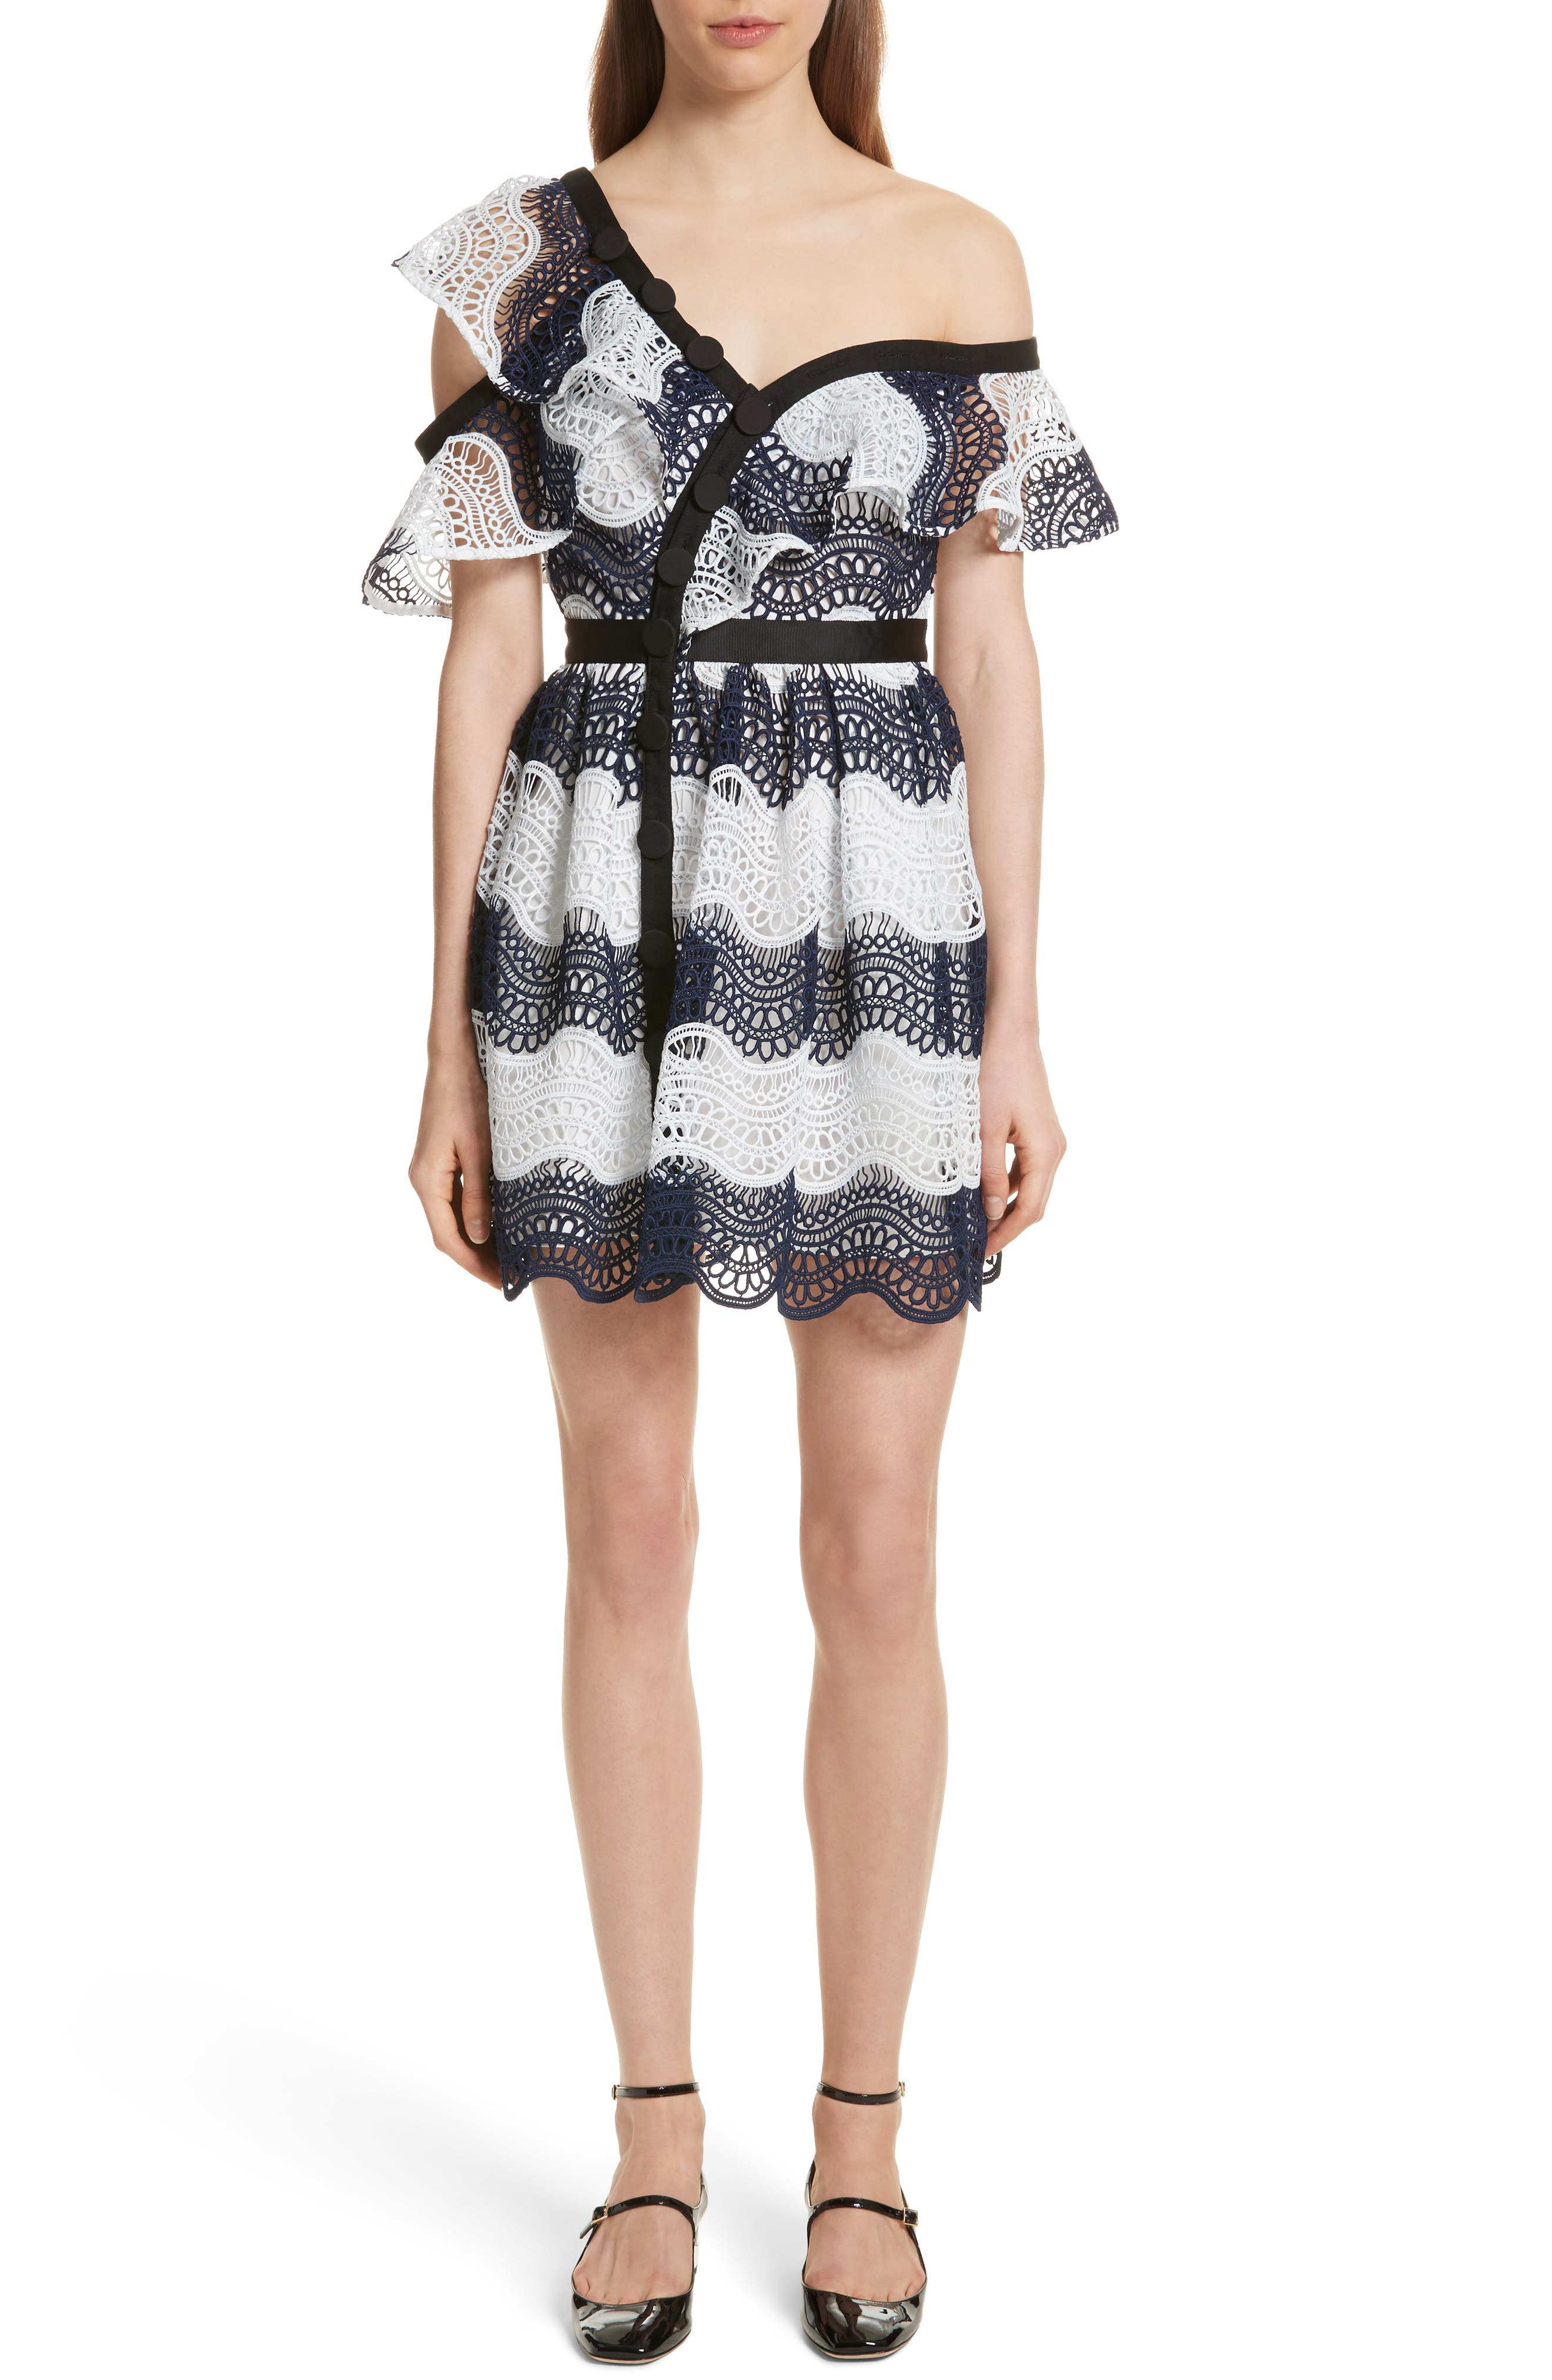 Main Image - Self-Portrait Wave Lace Frill Minidress